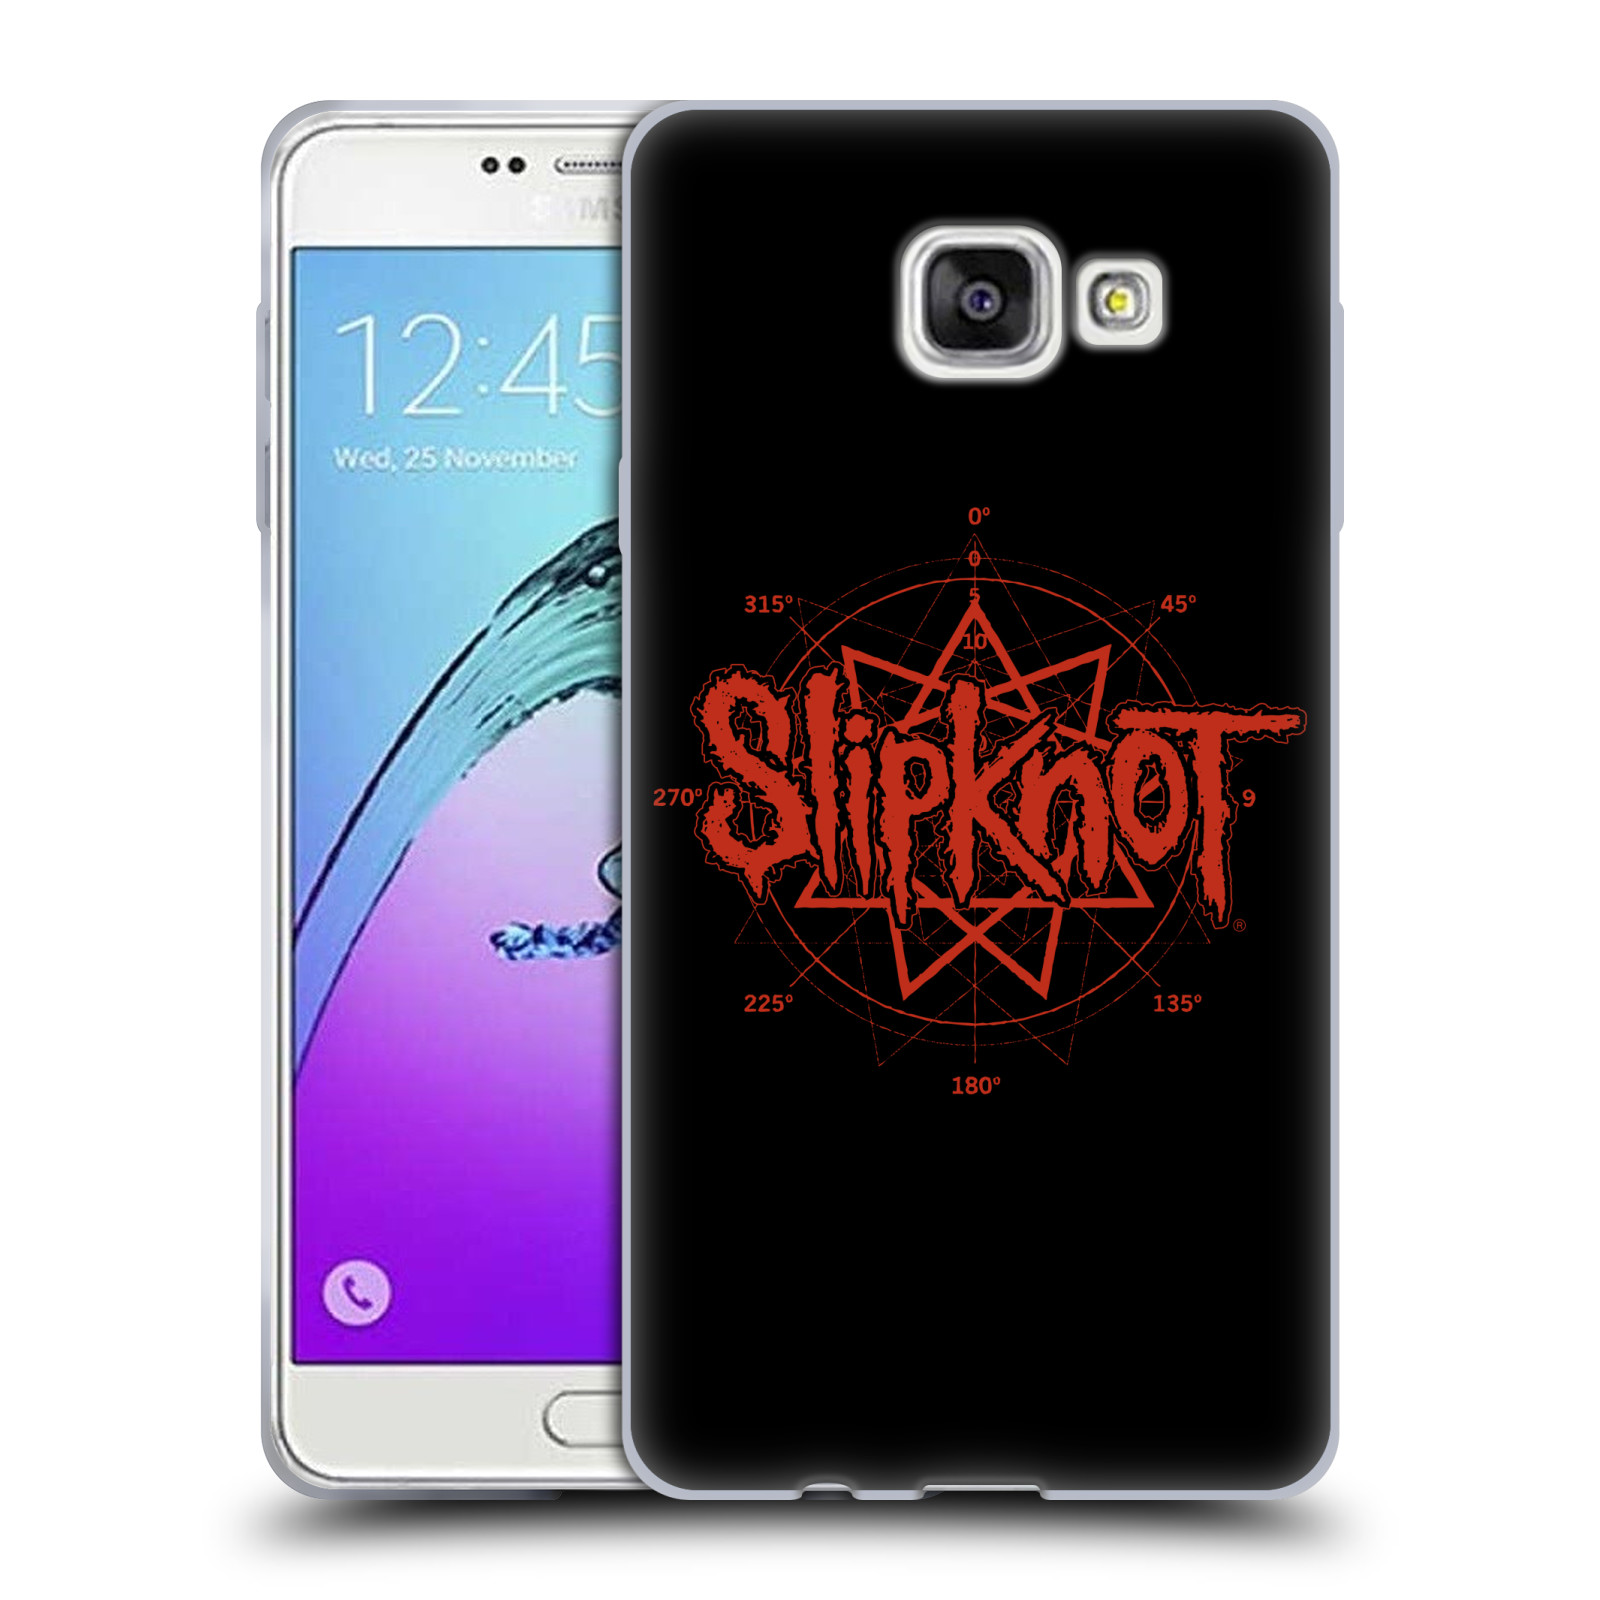 HEAD CASE silikonový obal na mobil Samsung Galaxy A7 2017 (A720) hudební skupina Slipknot logo